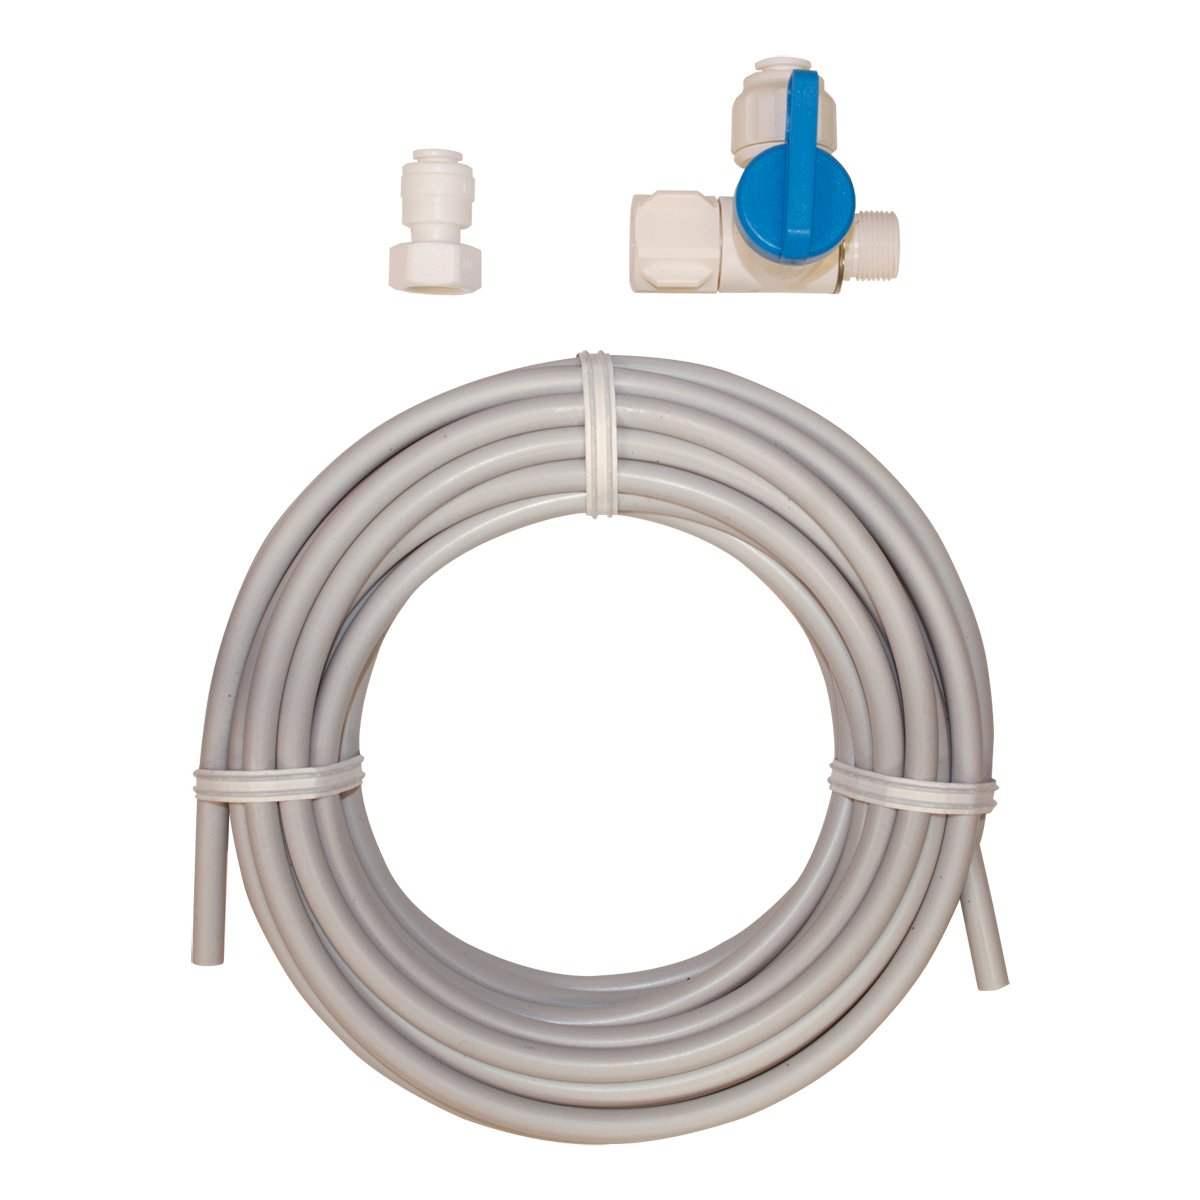 Eastman 60467N PEX Ice Maker Connector 25' Kit White